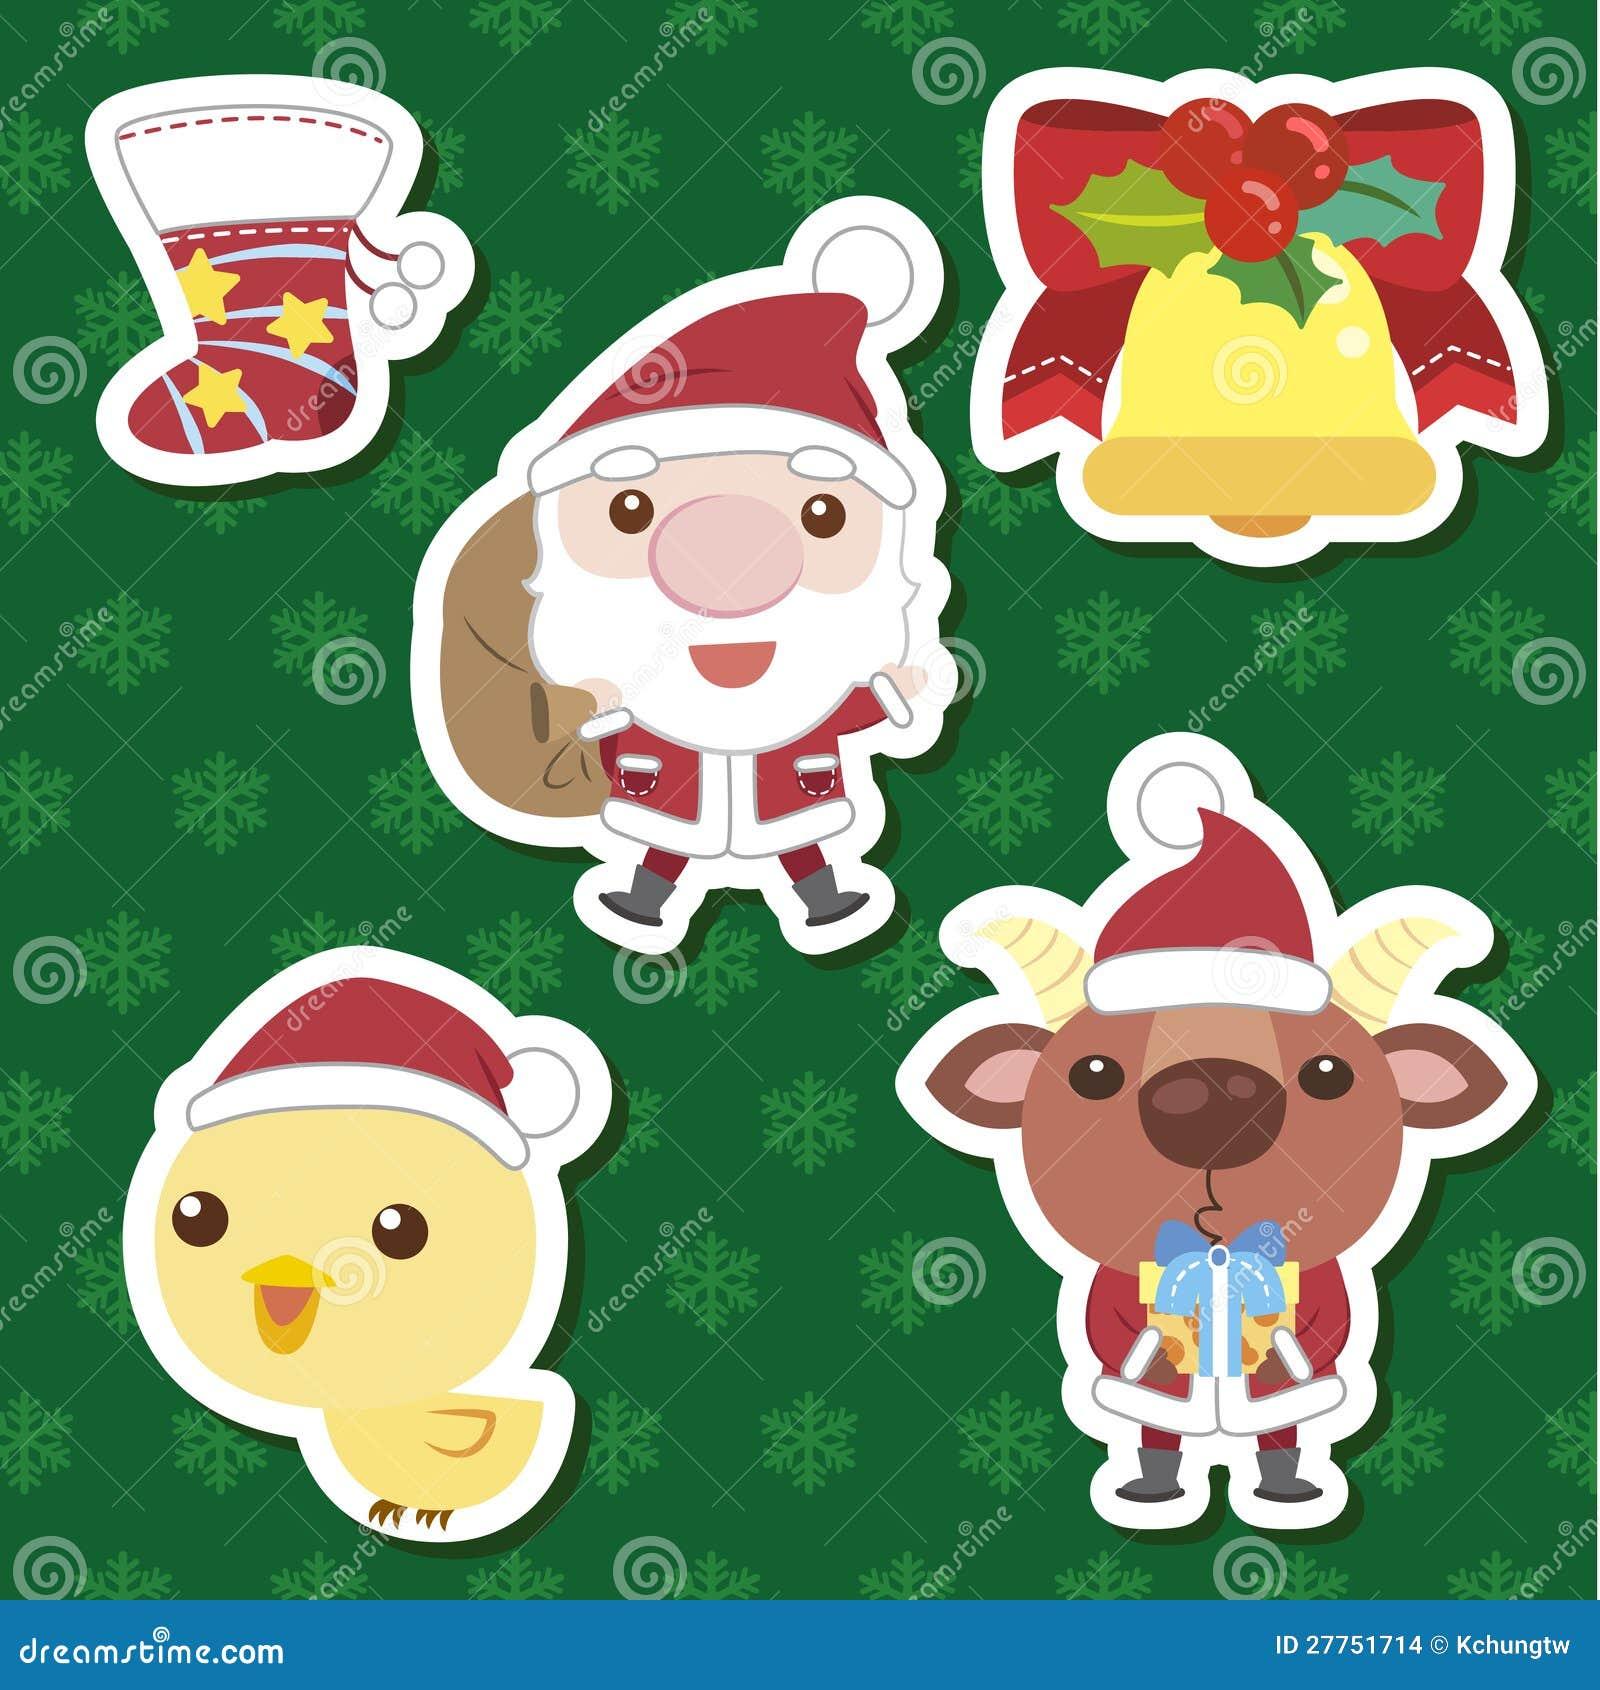 Xmas cute cartoon set stock vector. Illustration of design - 27751714